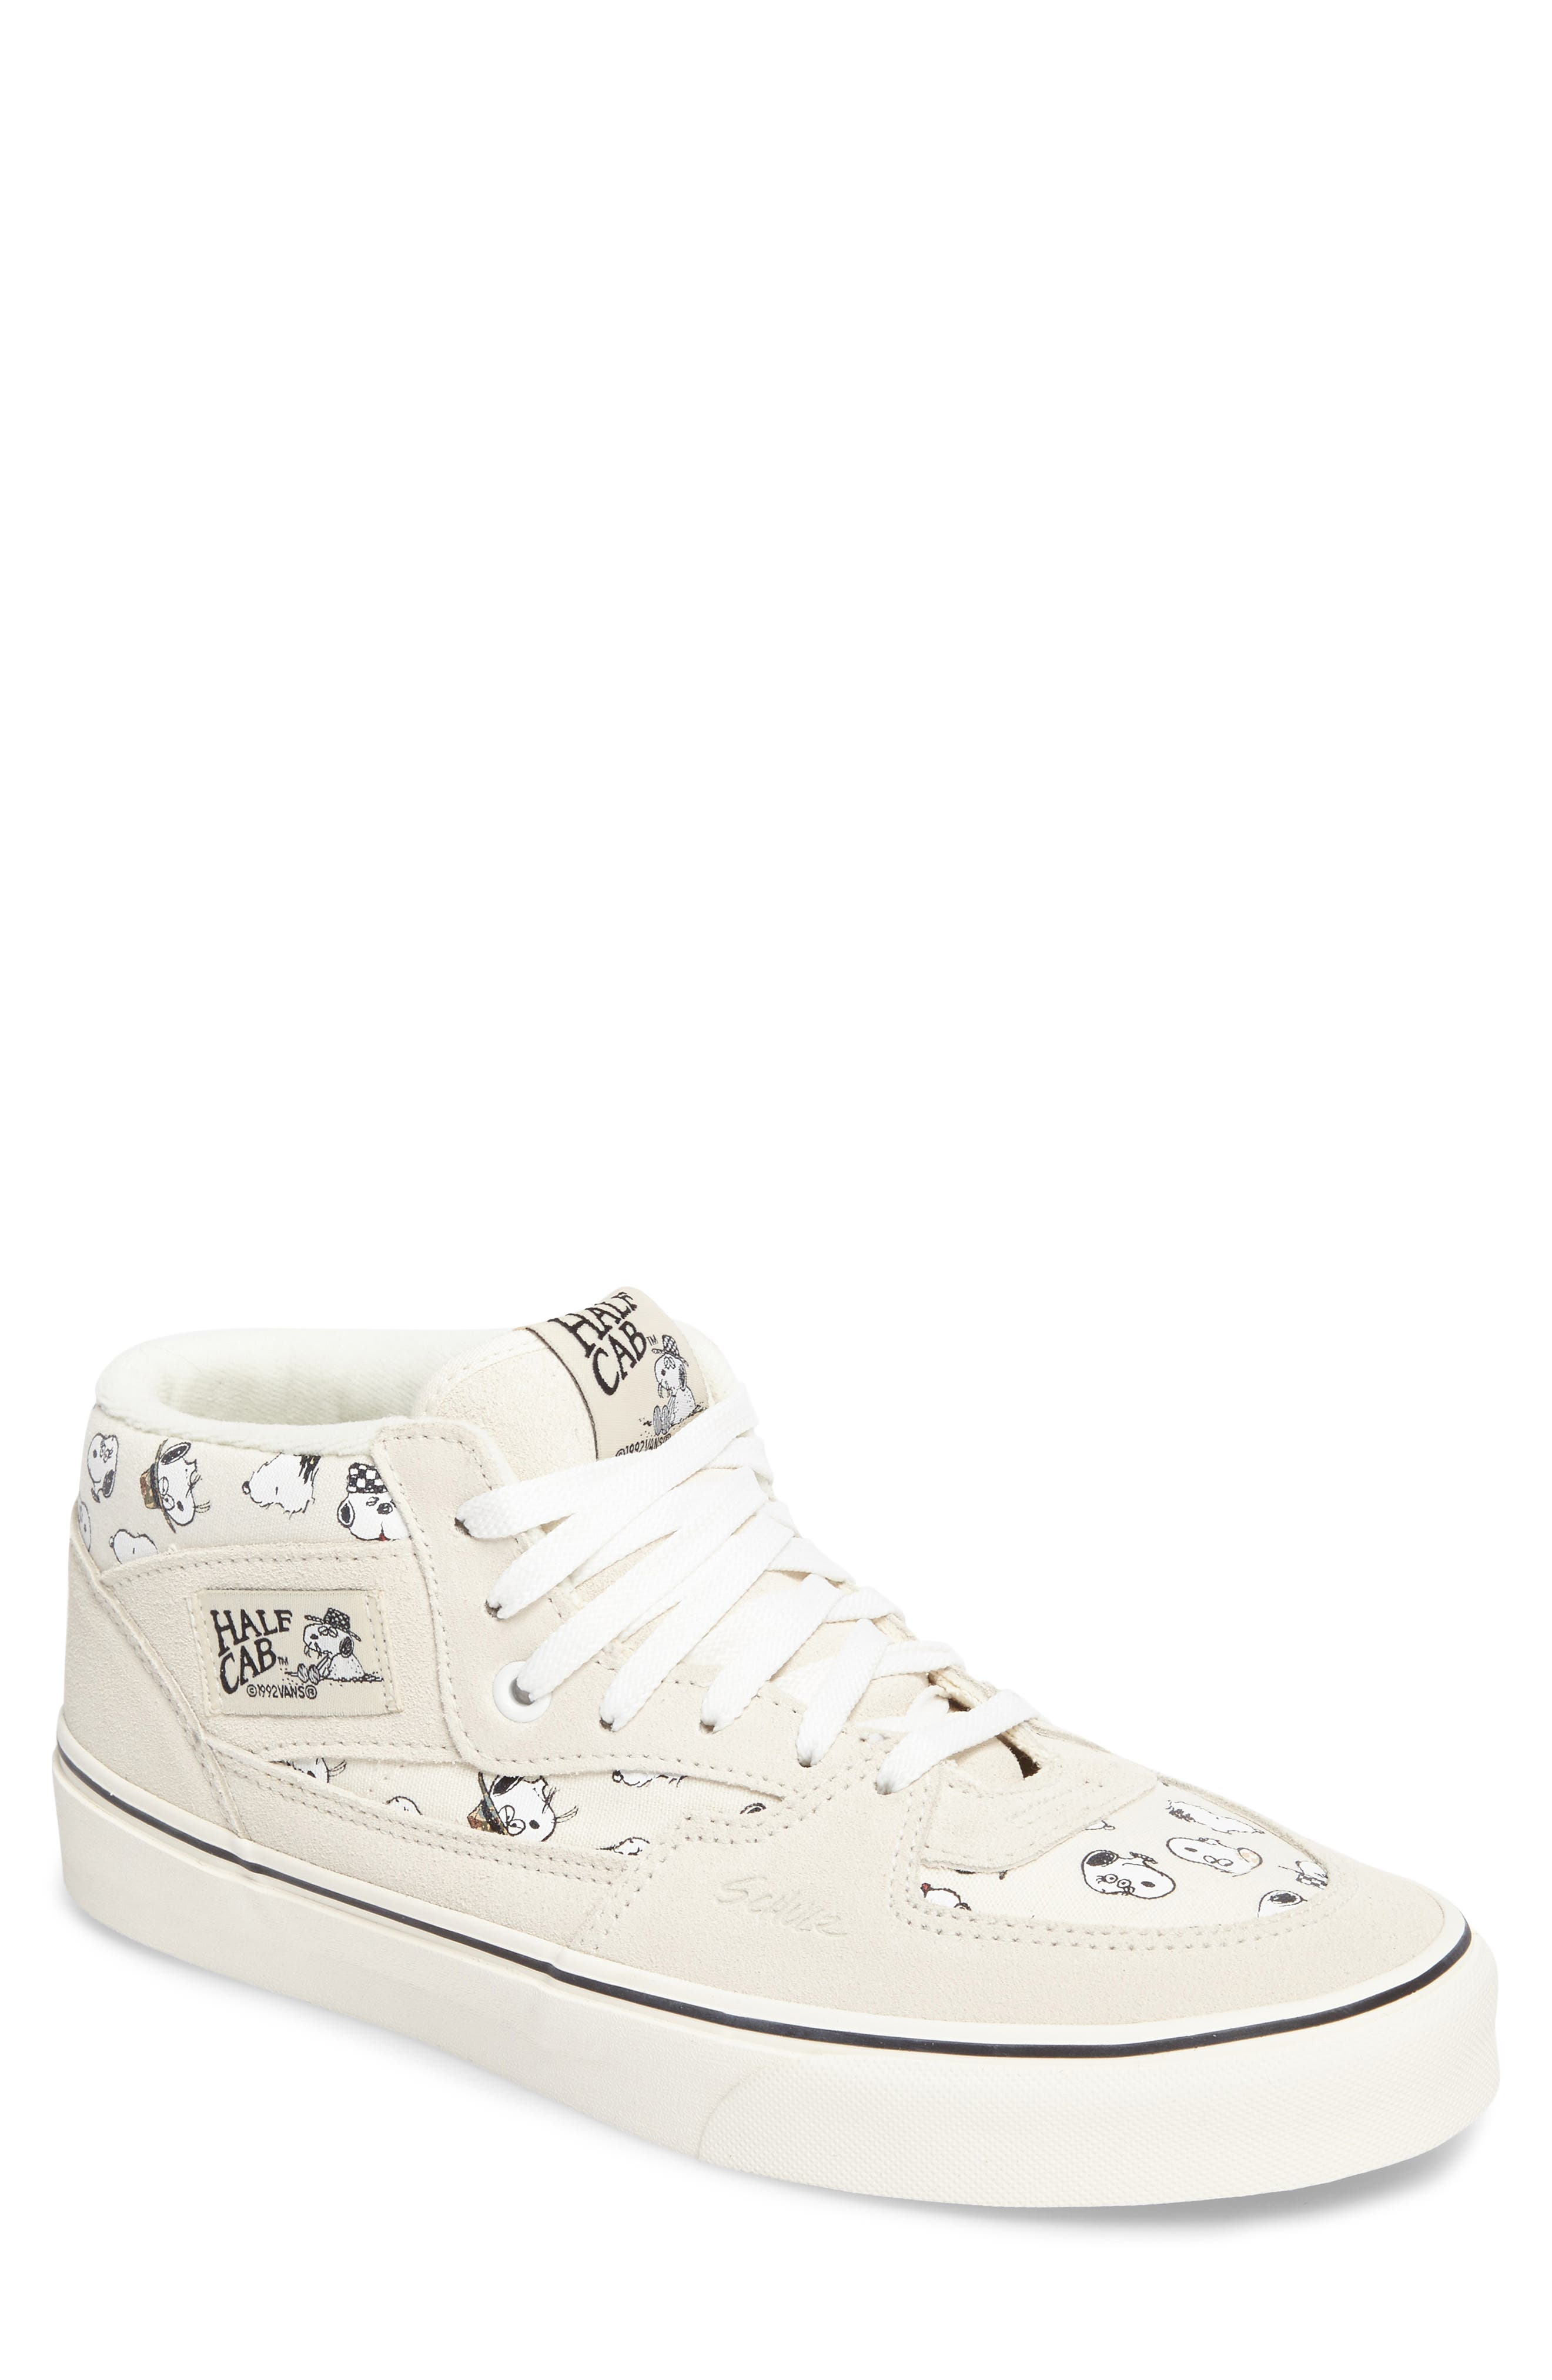 x Peanuts<sup>®</sup> Half Cab Sneaker,                         Main,                         color, 100